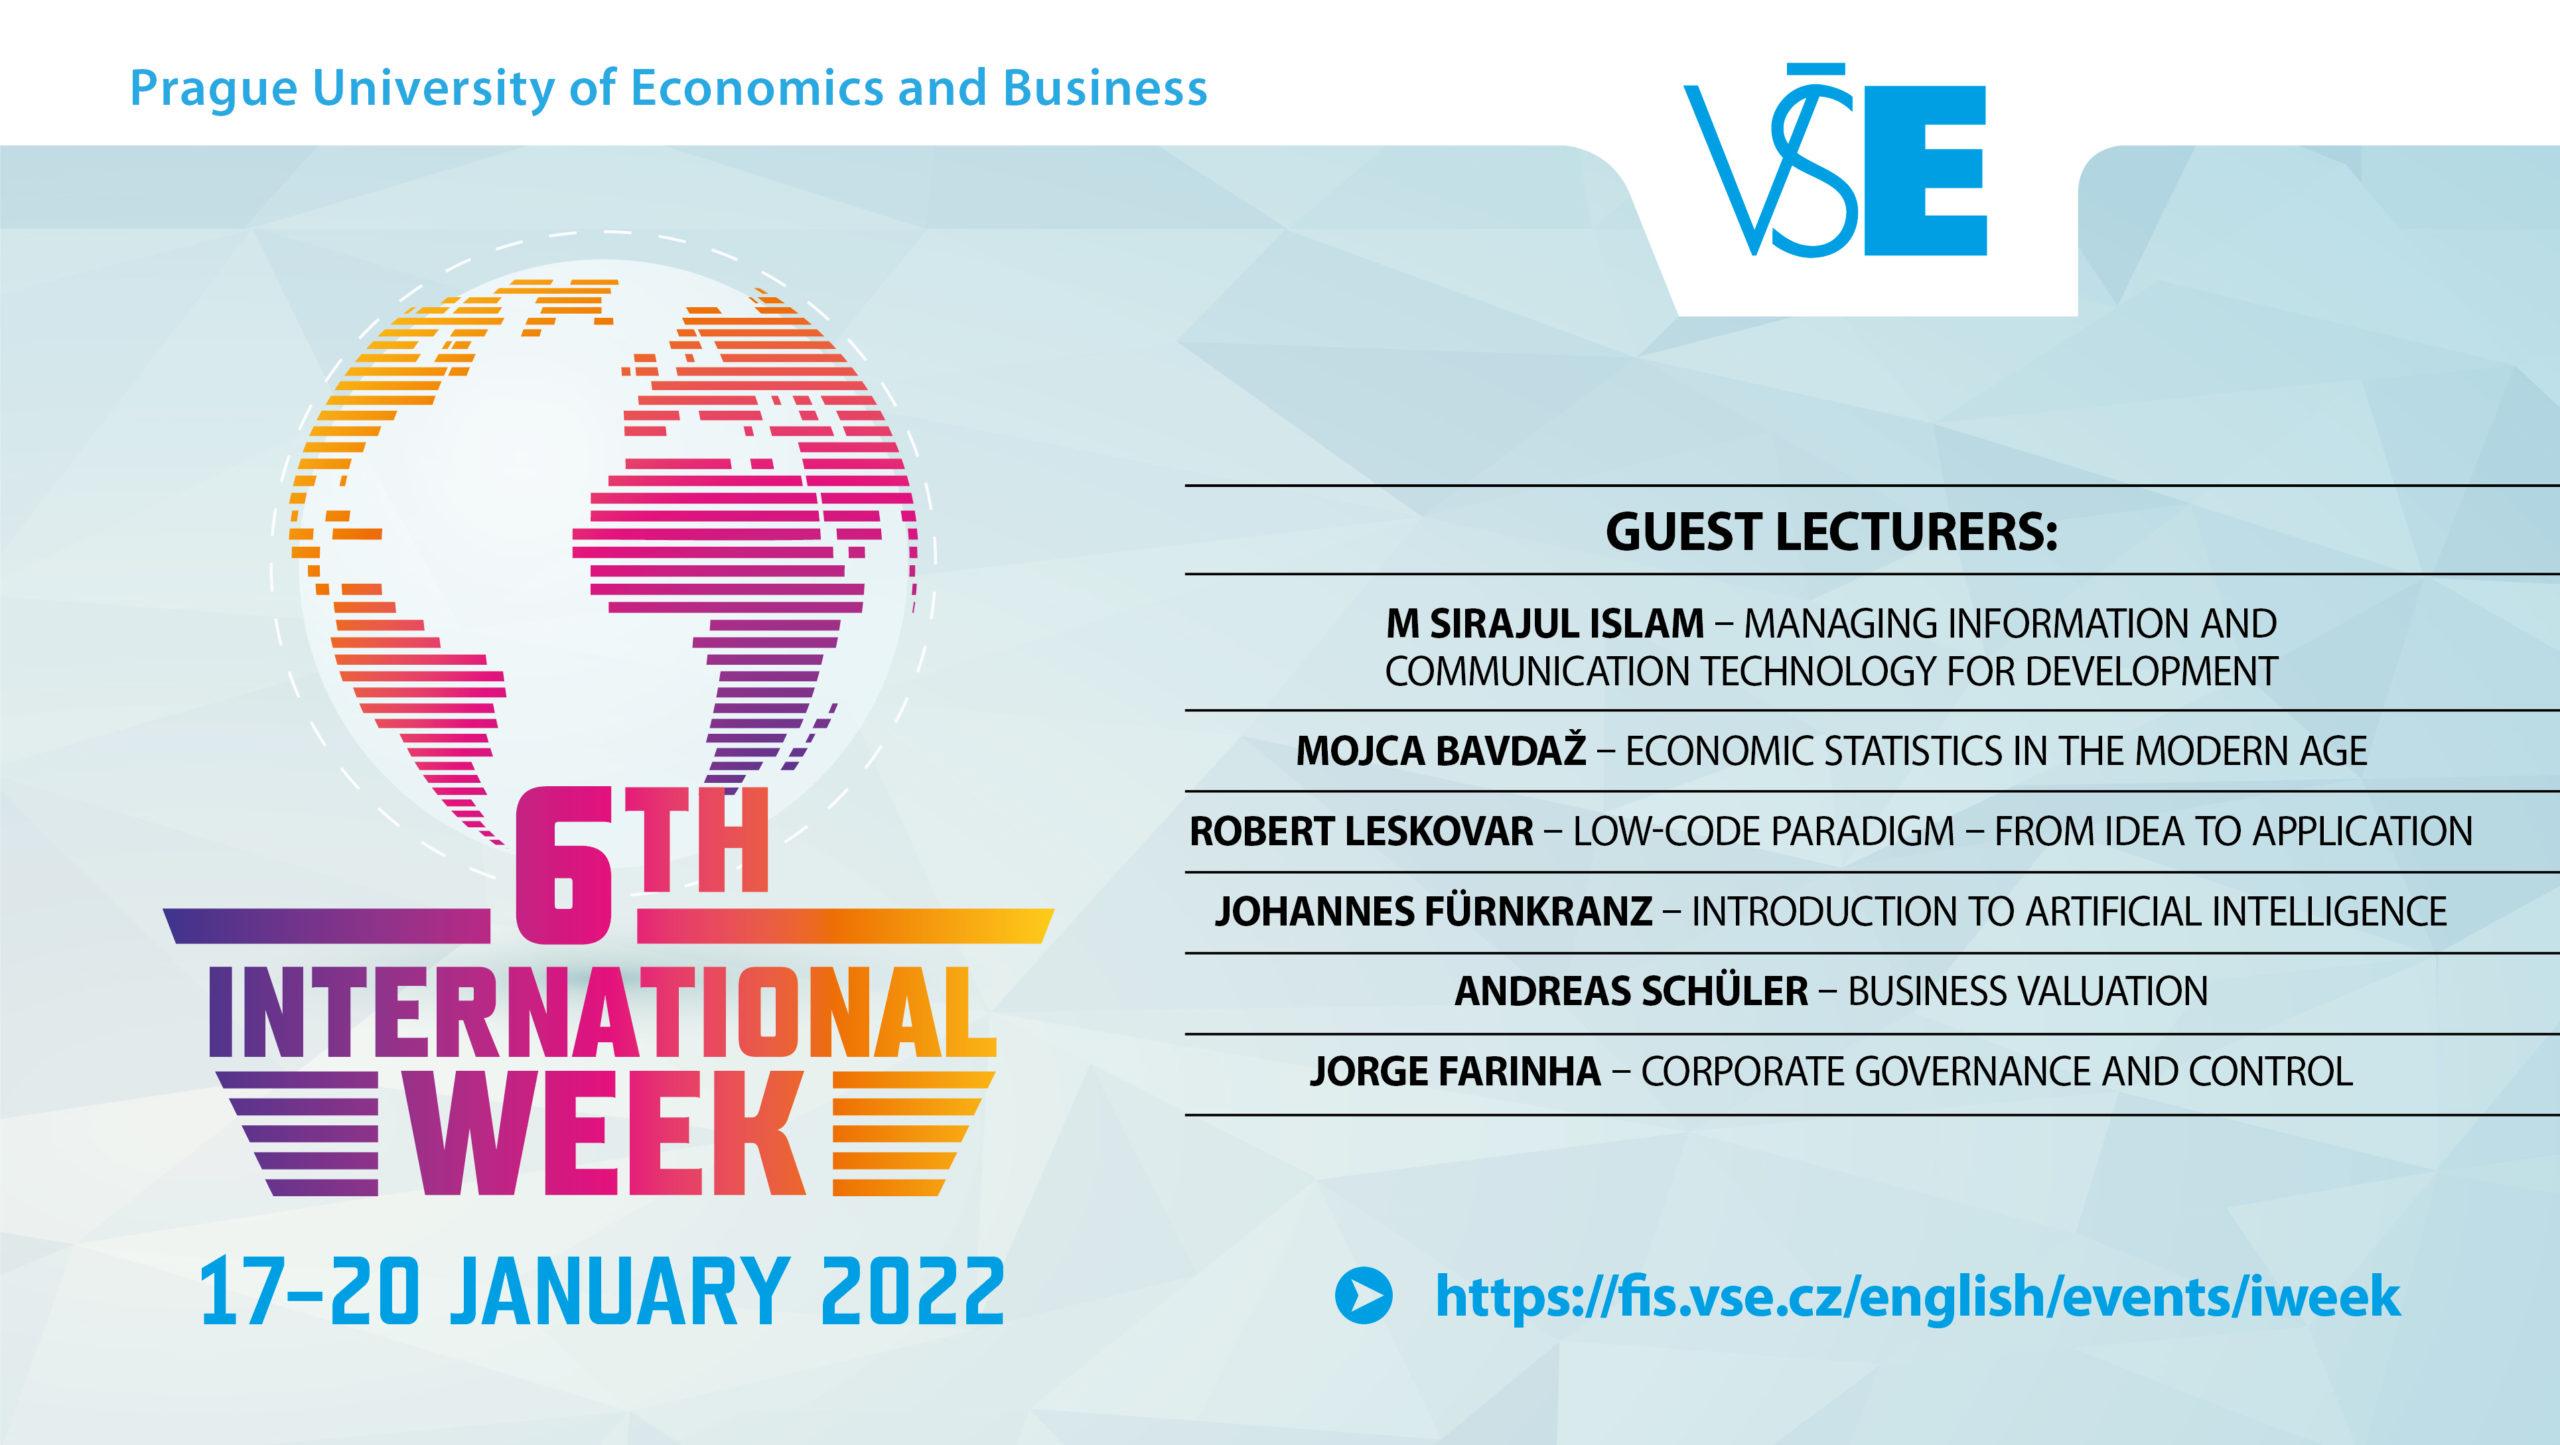 International Week: kurz Corporate Governance & Control